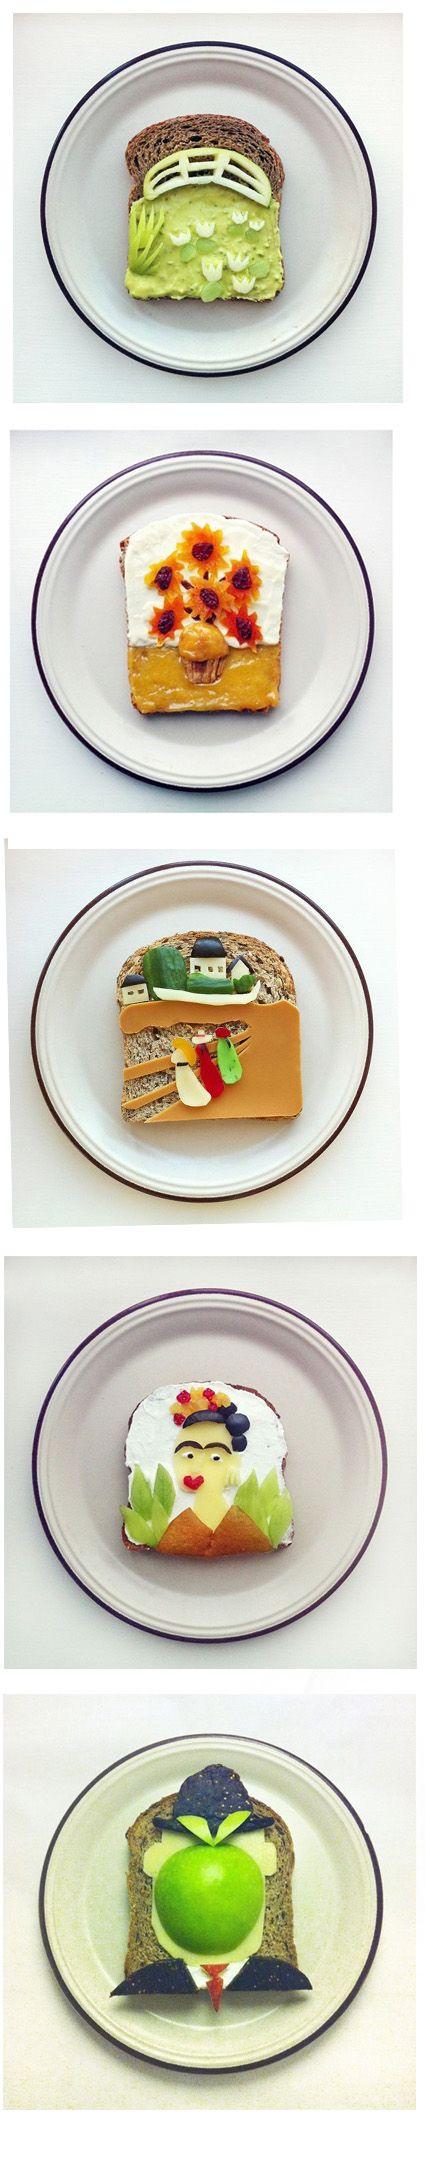 Homemade toast art. Monet, Van Gogh, Munch, Kahlo, Magritte